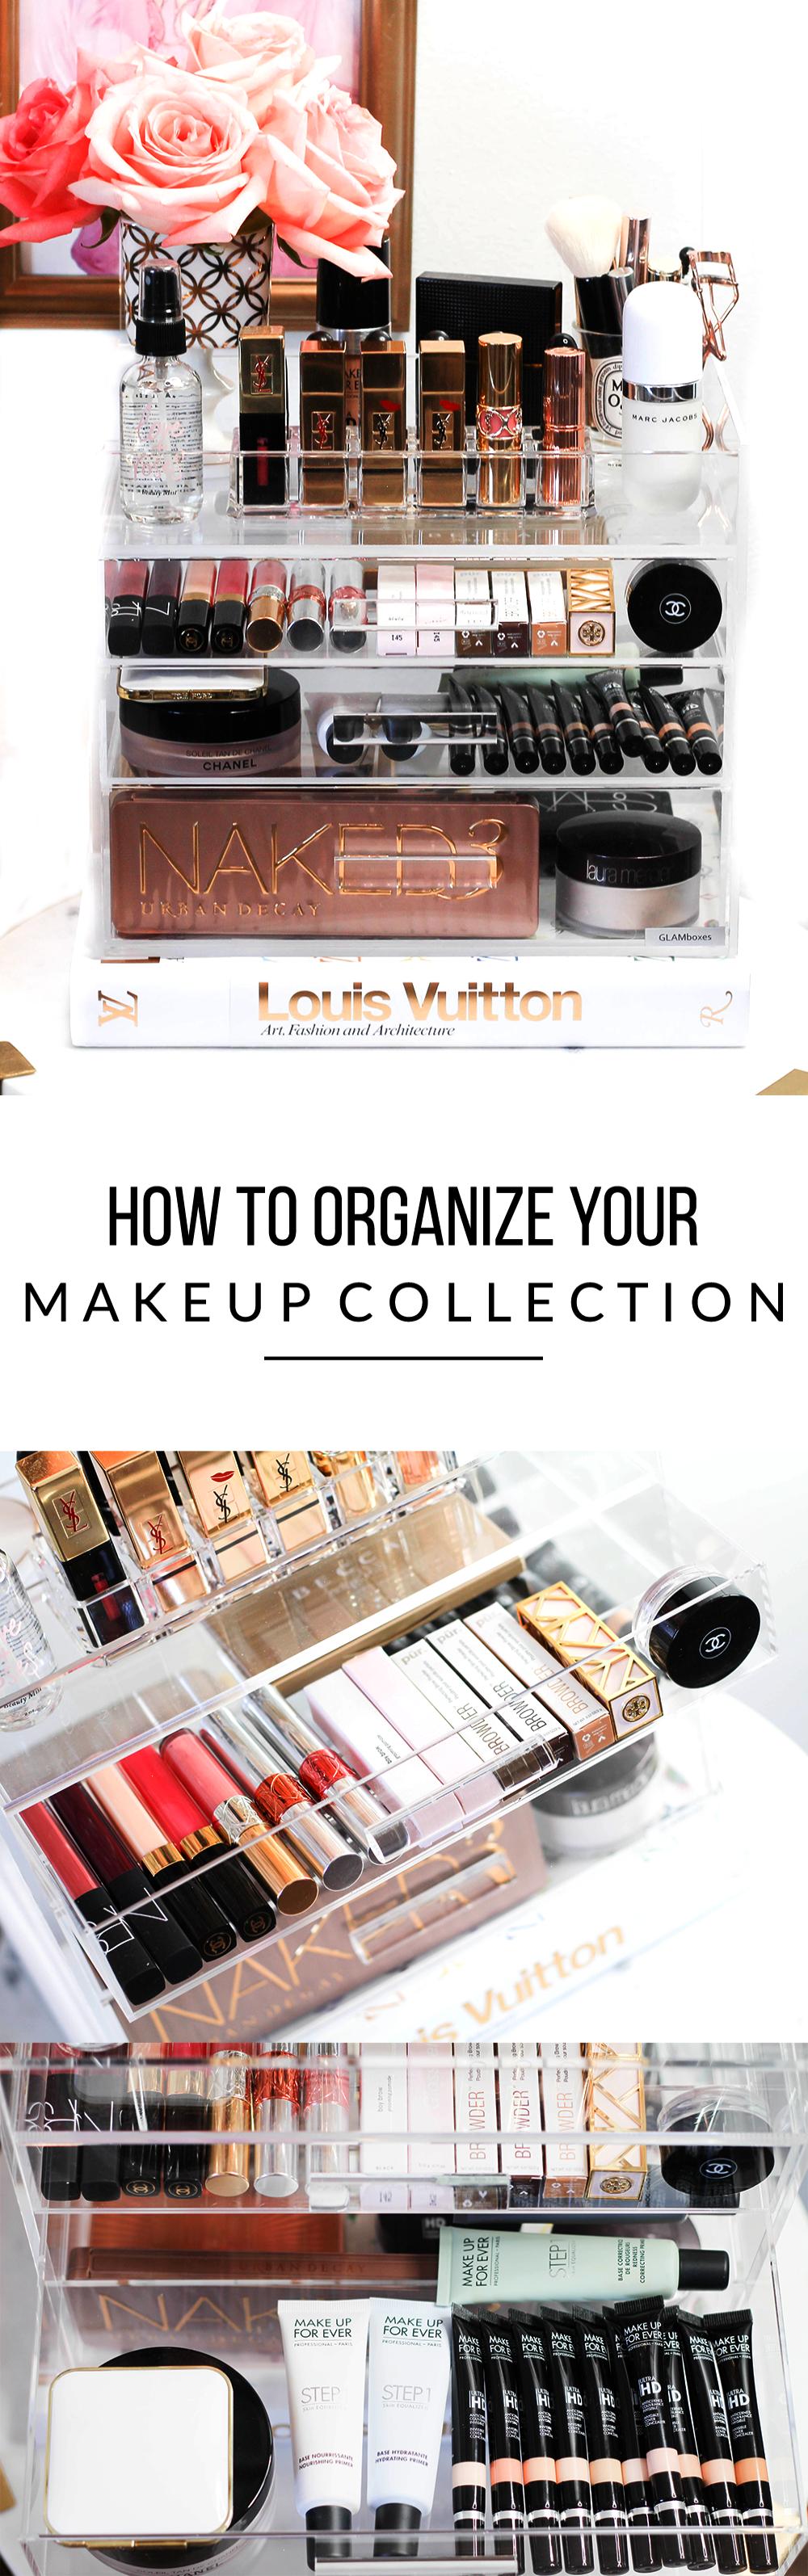 How To Organize Your Makeup Collection - Makeup Organization -